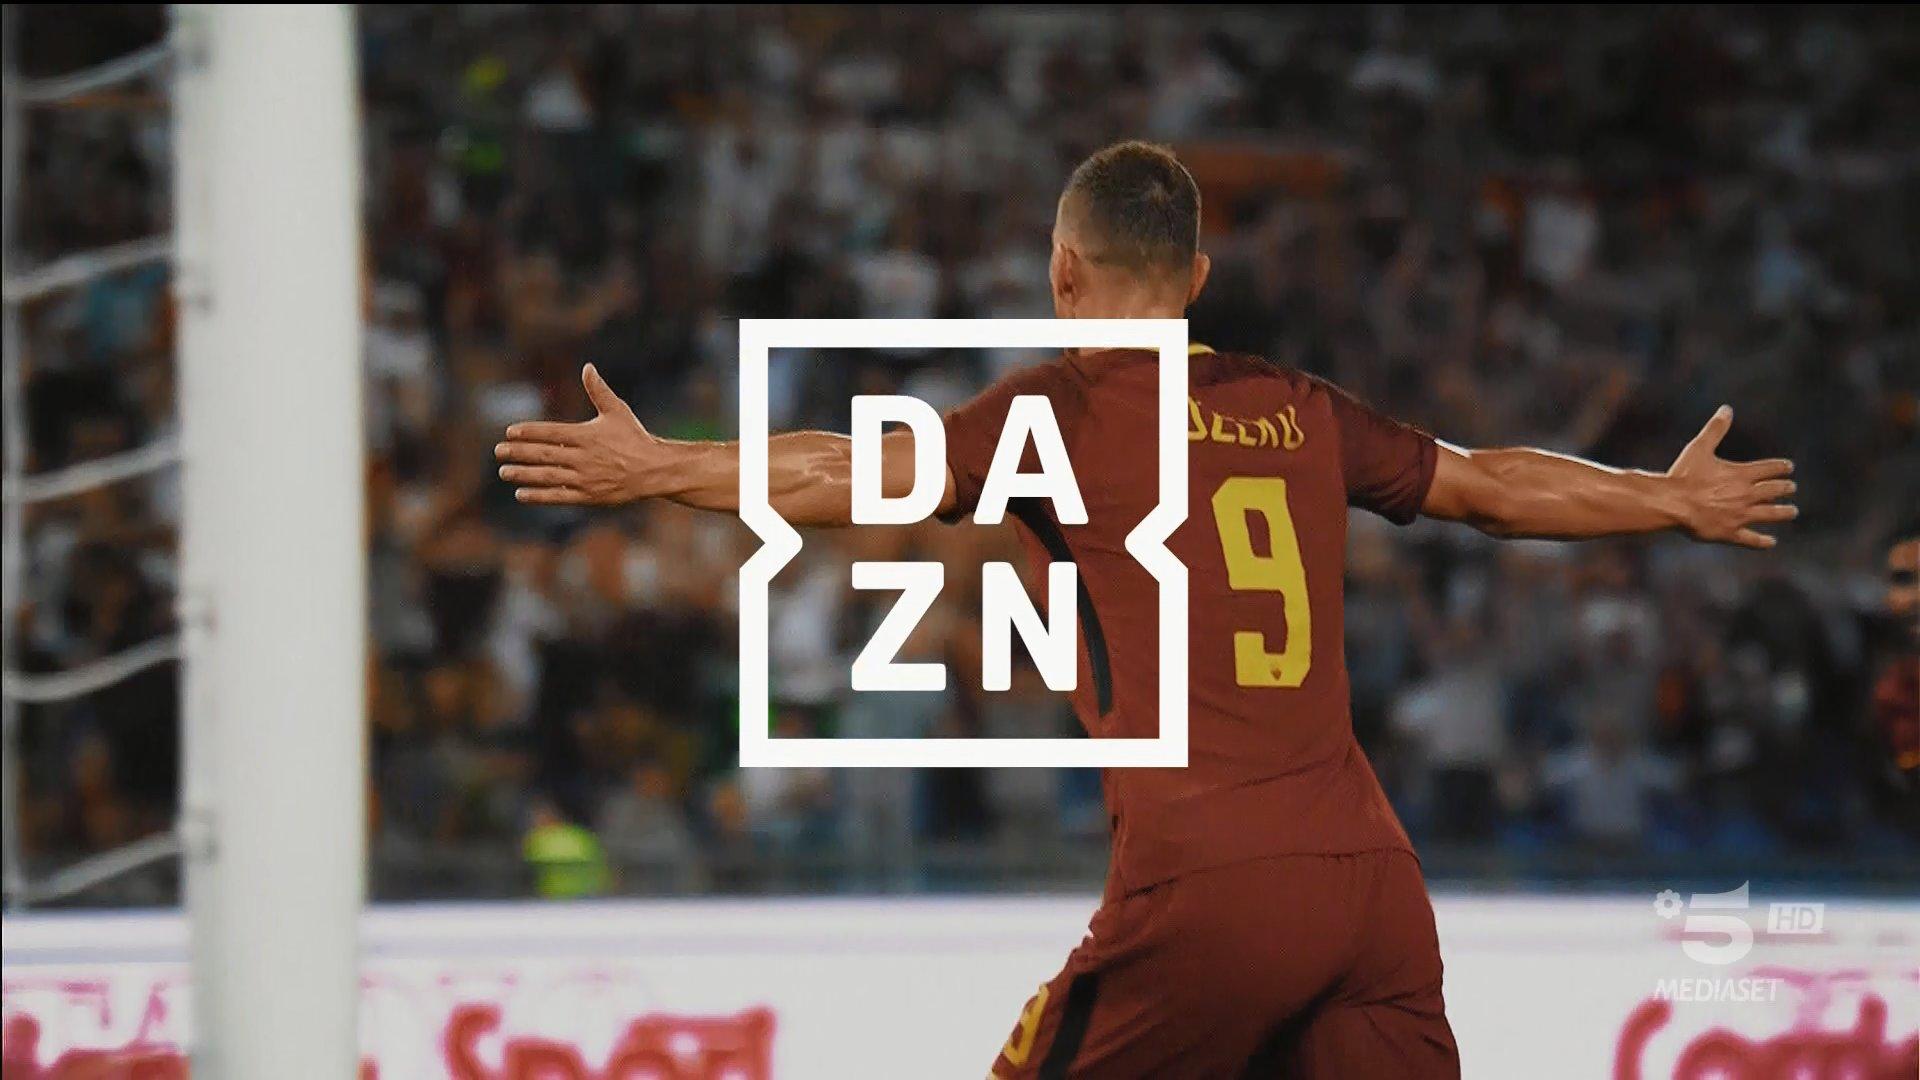 Diritti Tv Serie A 2021 - 2024, a DAZN 7 partite in esclusiva (+ 3 in co-esclusiva)